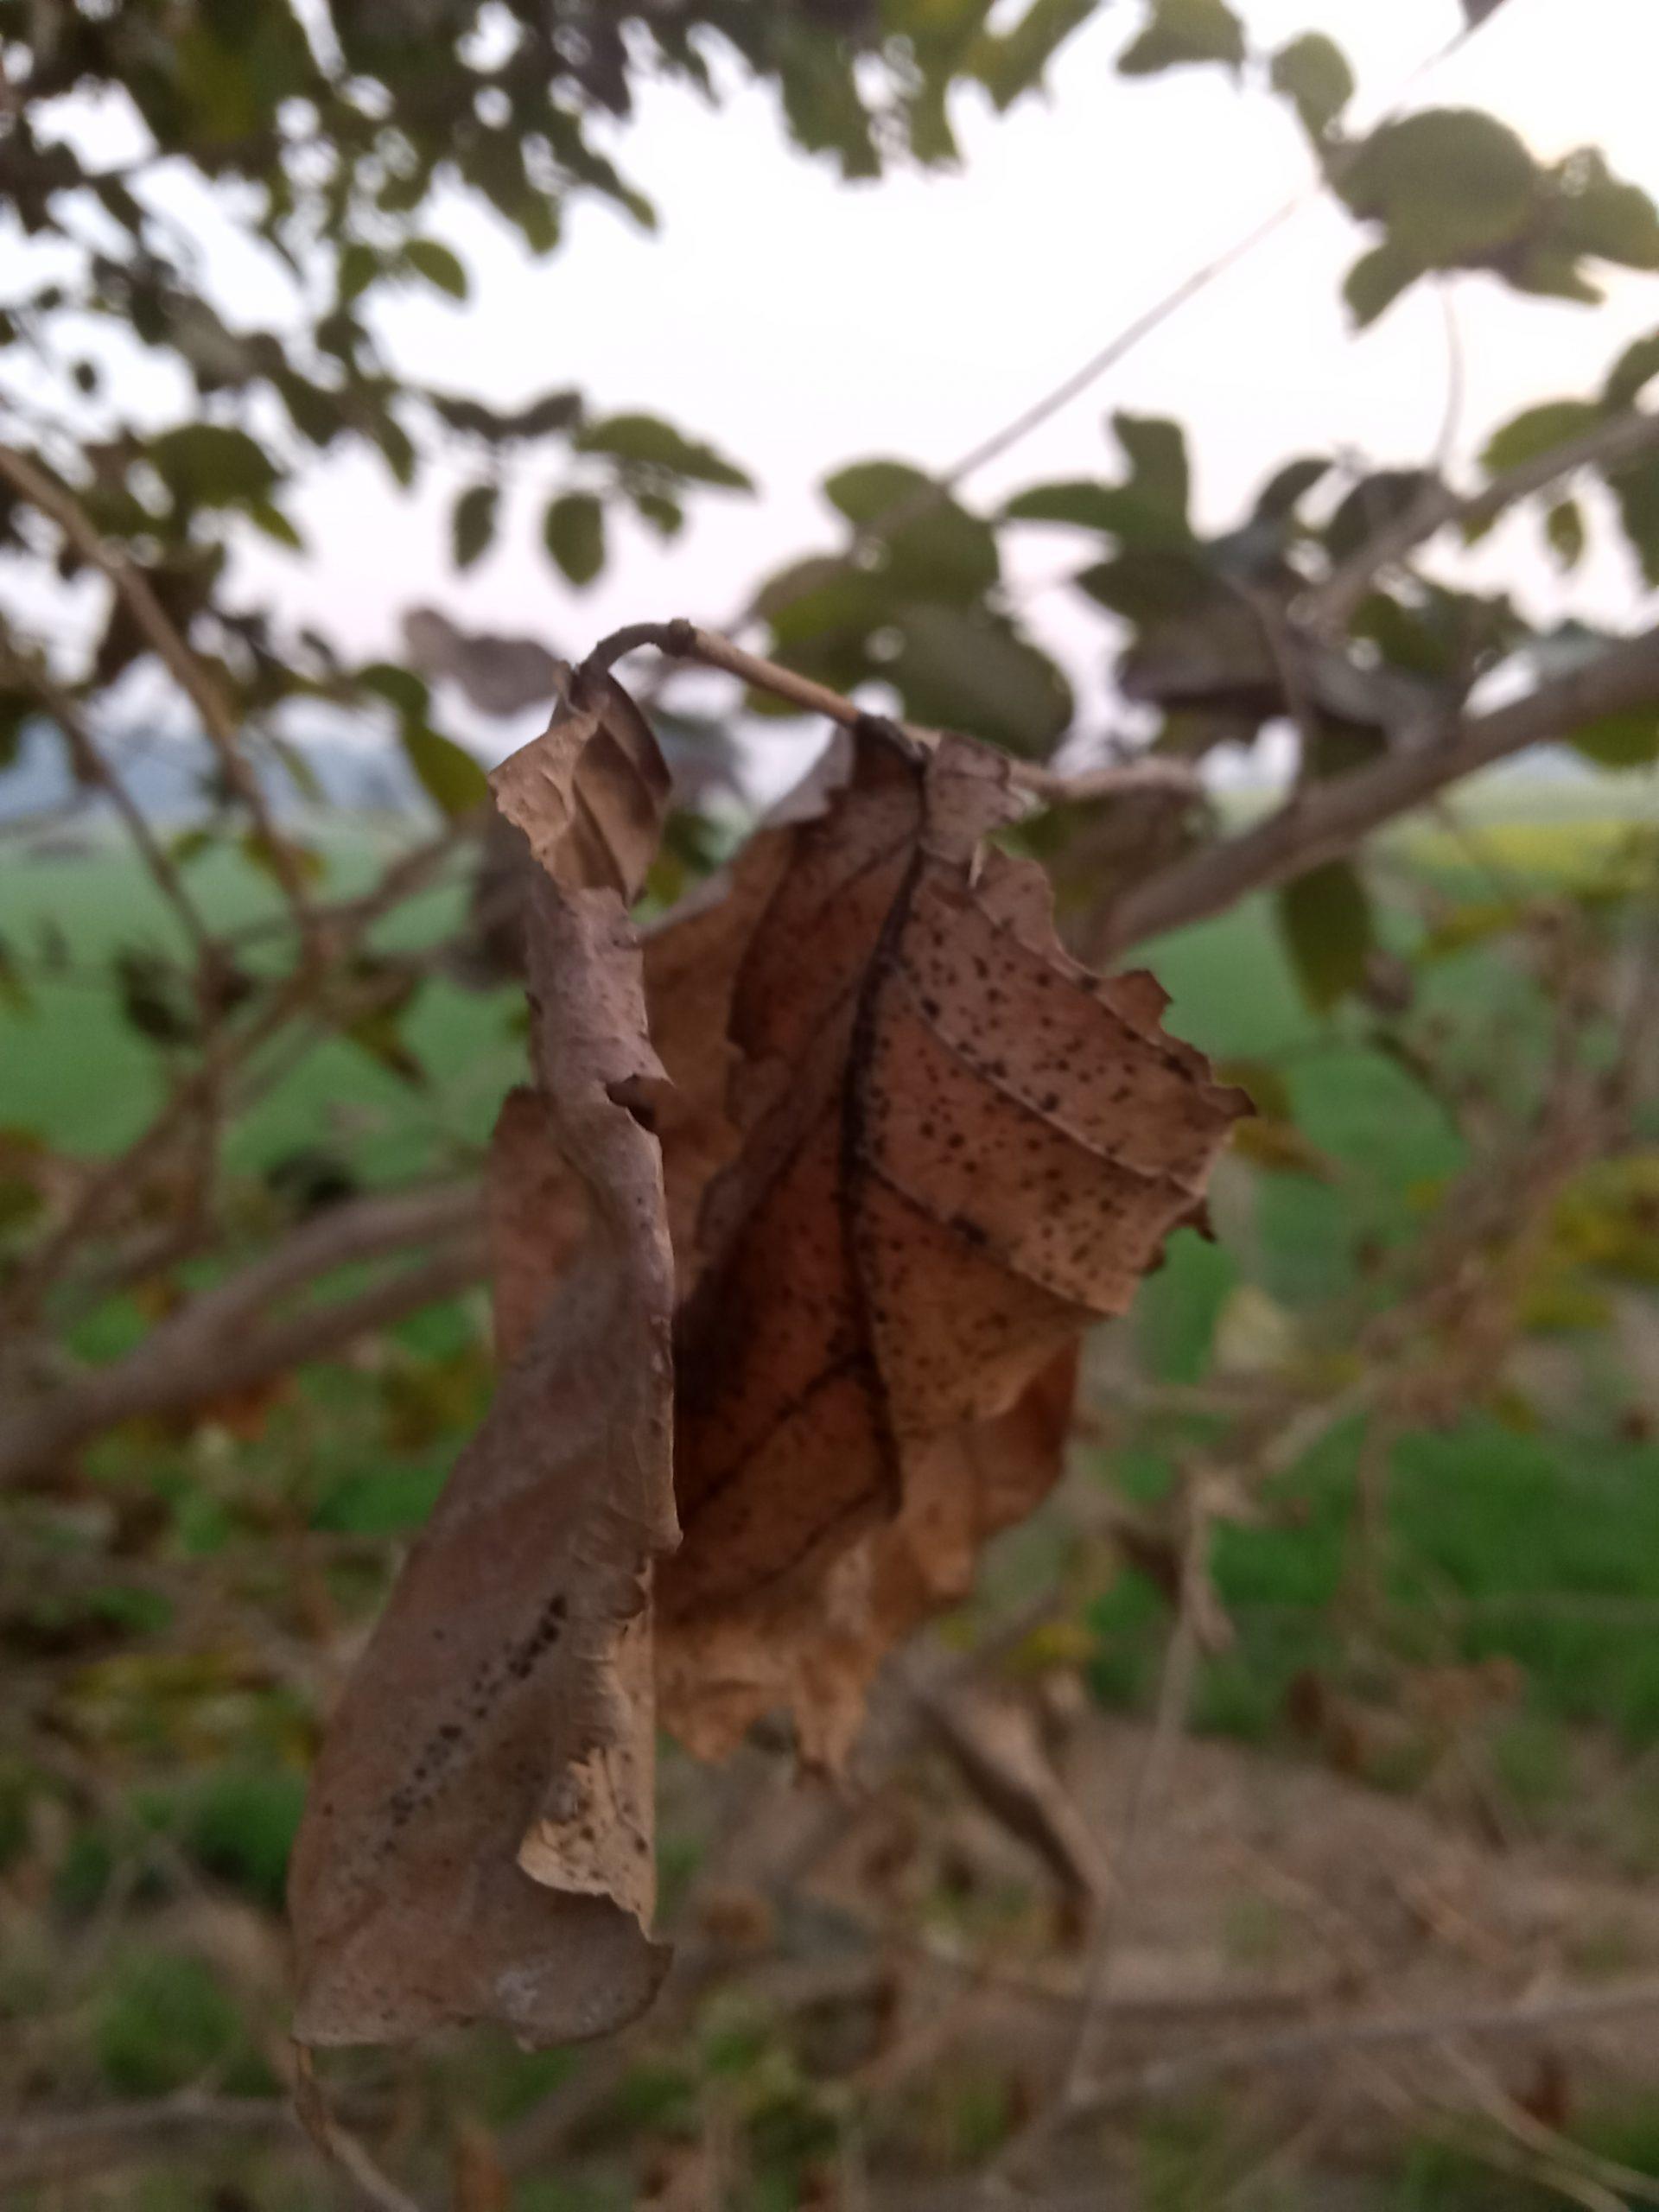 Close-up of dry Leaf